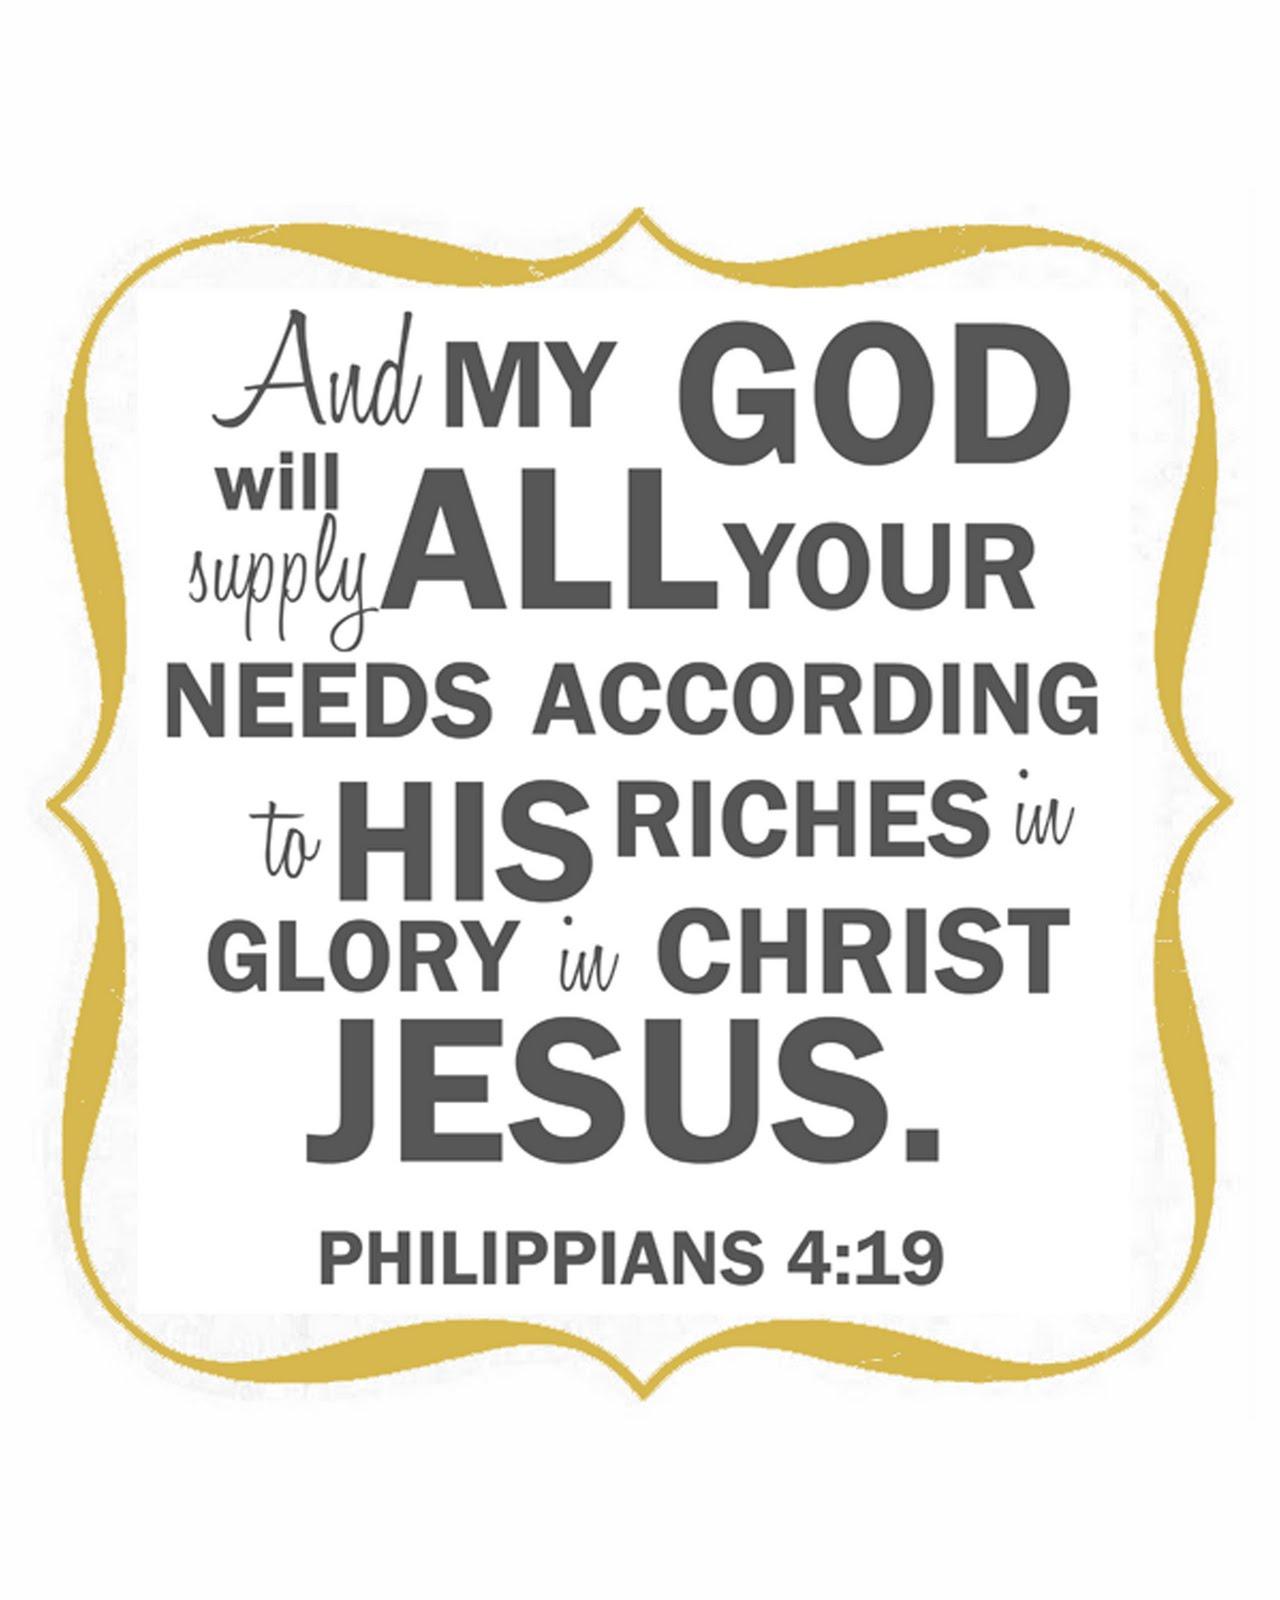 JAMES A.E. MACLELLAN: Misused Bible Verses That Should Concern You –  Philippians 4:19